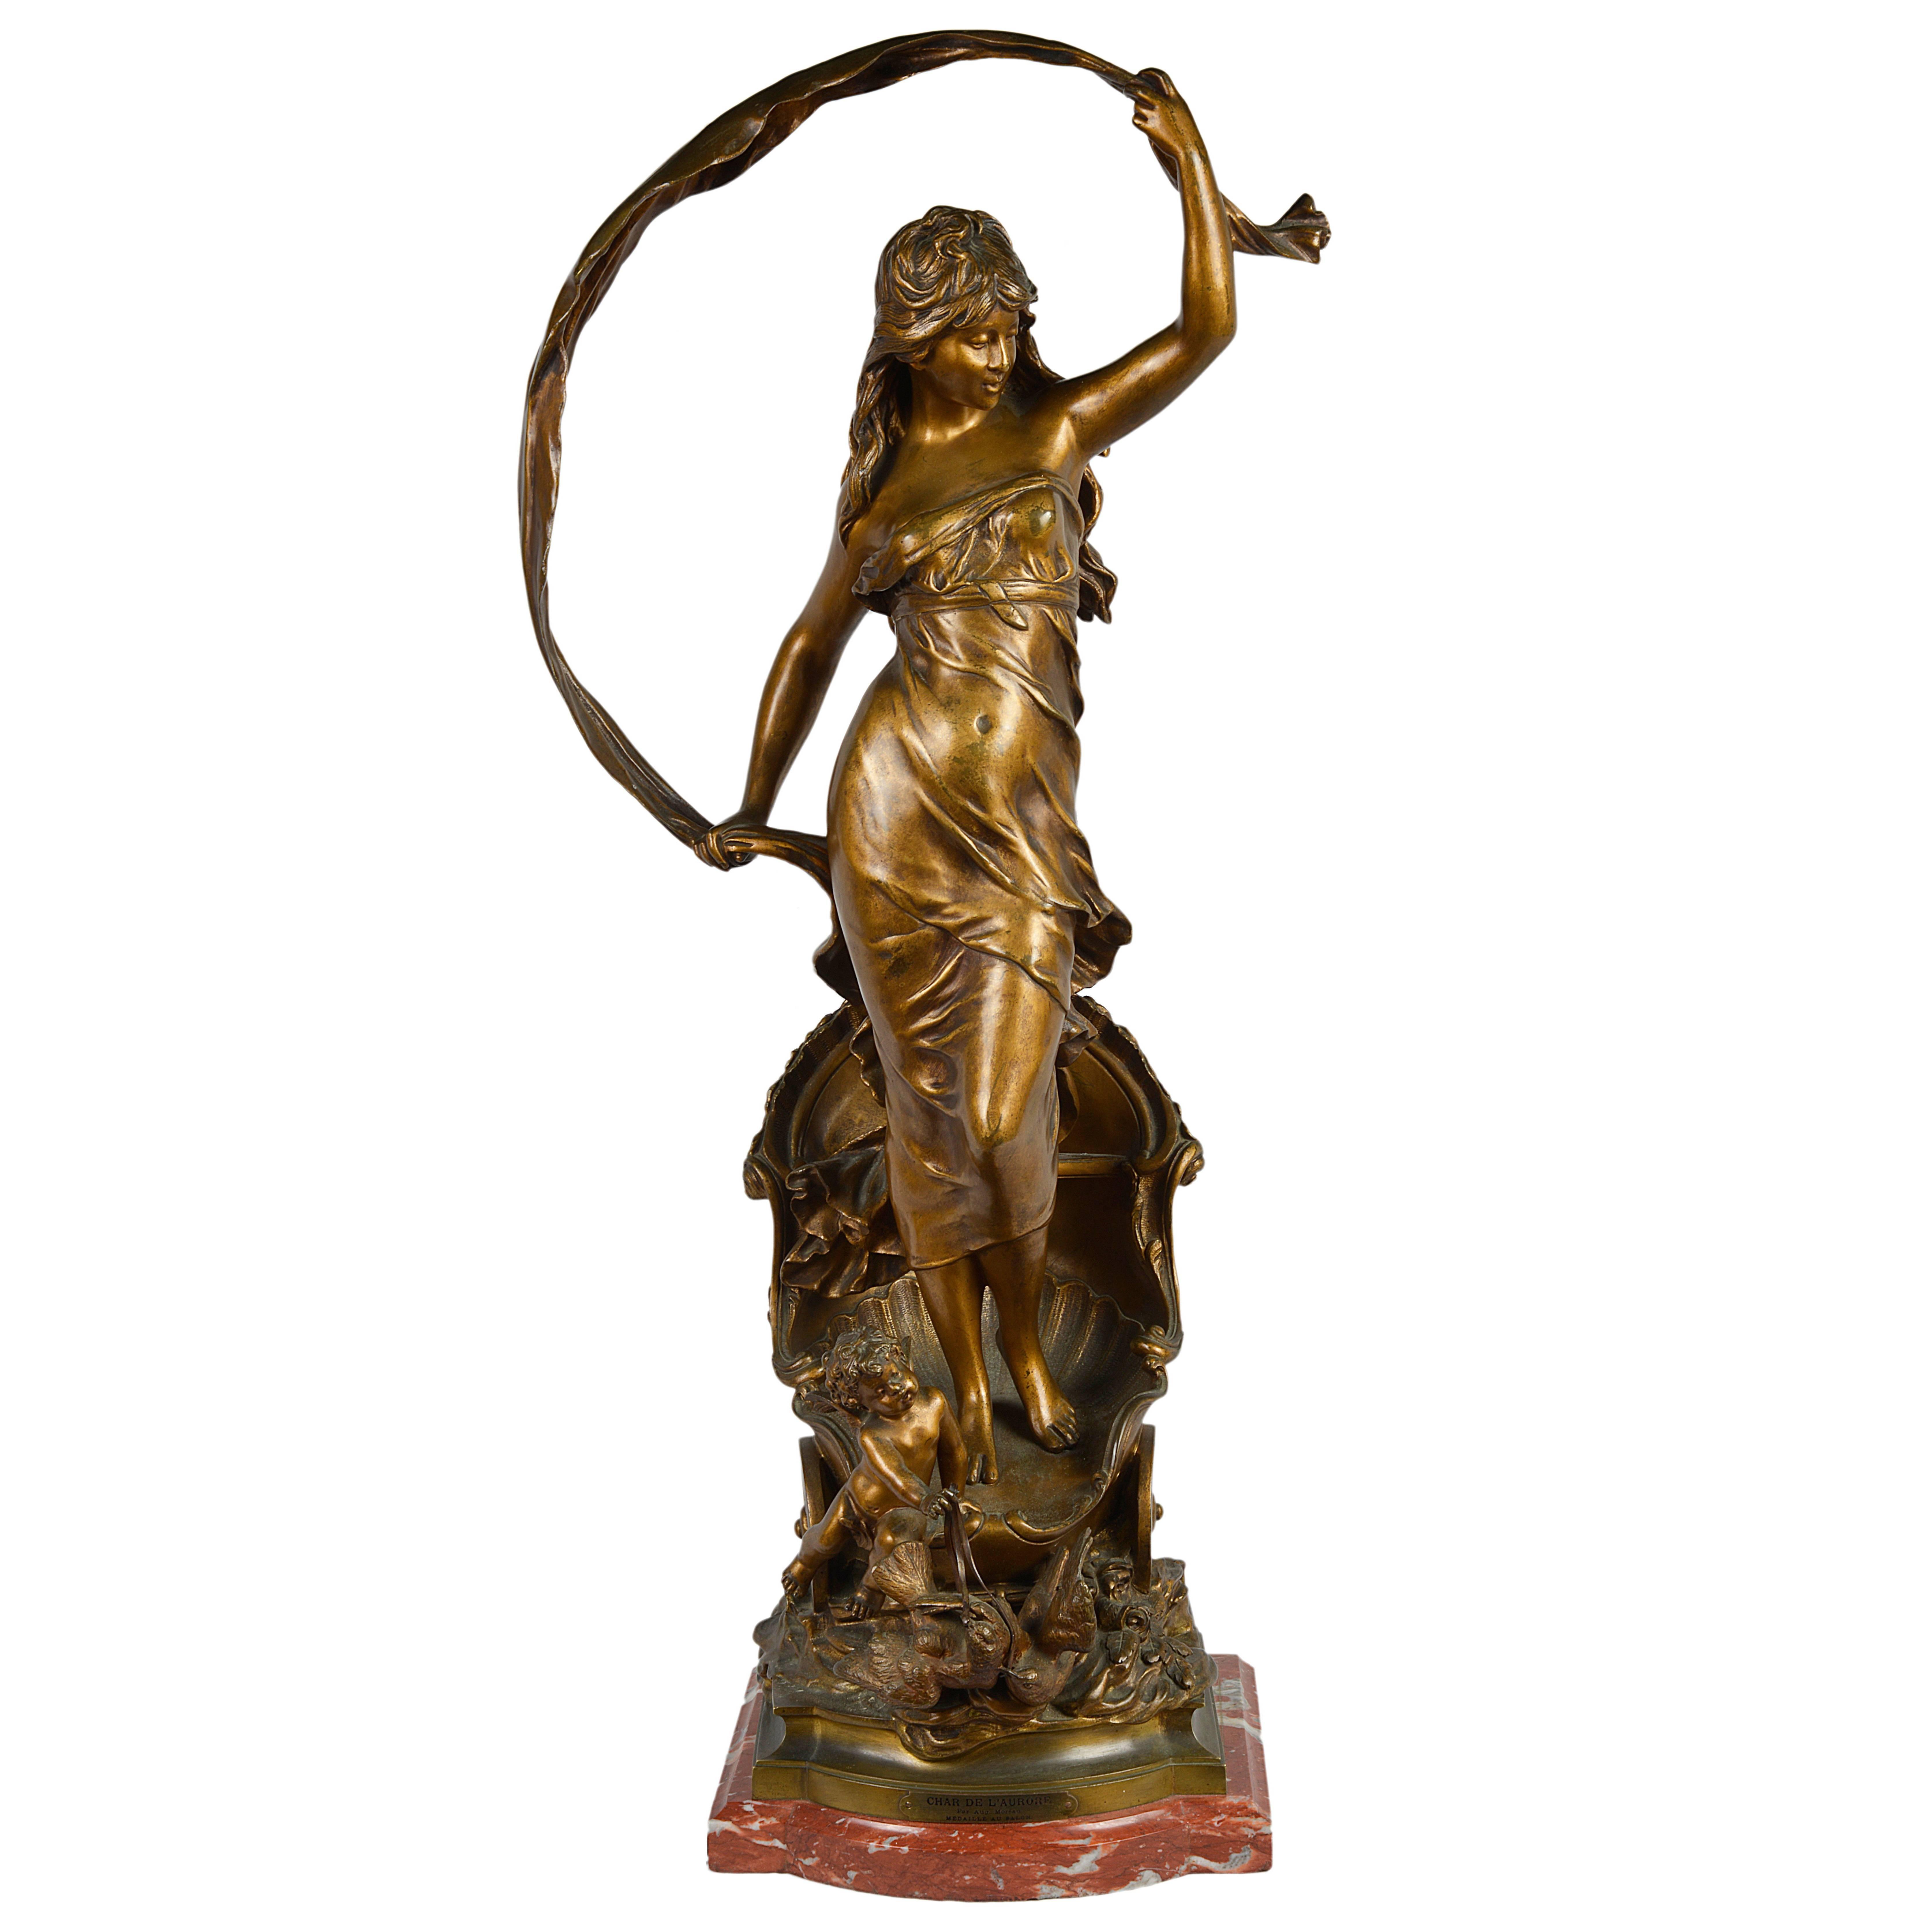 Auguste Moreau, Bronze Statue of Le Char D'Aurore 'The Chariot of Aurora'